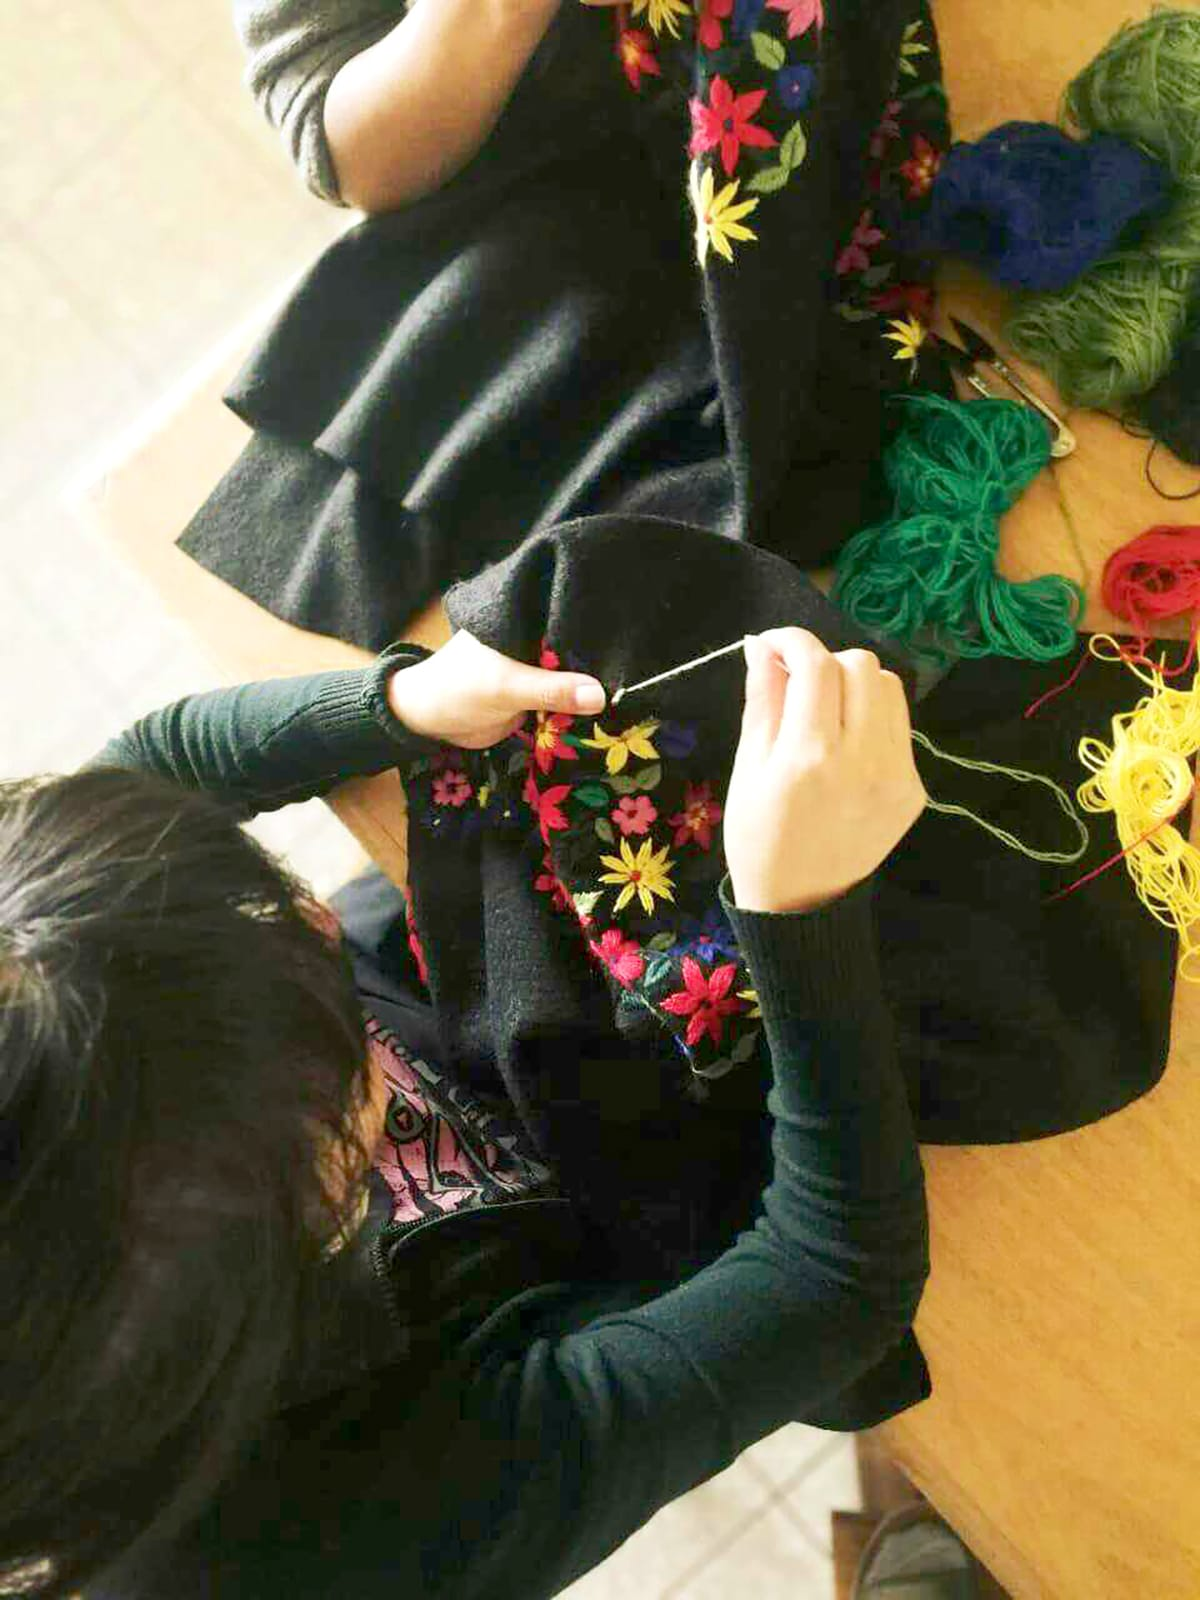 Broderies faites a la main au Perou – Collection printemps ete 2019 – Bomber Bosque Tropical – 100 pour 100 Baby alpaga – Fleurs brodees main au Perou – Yacana